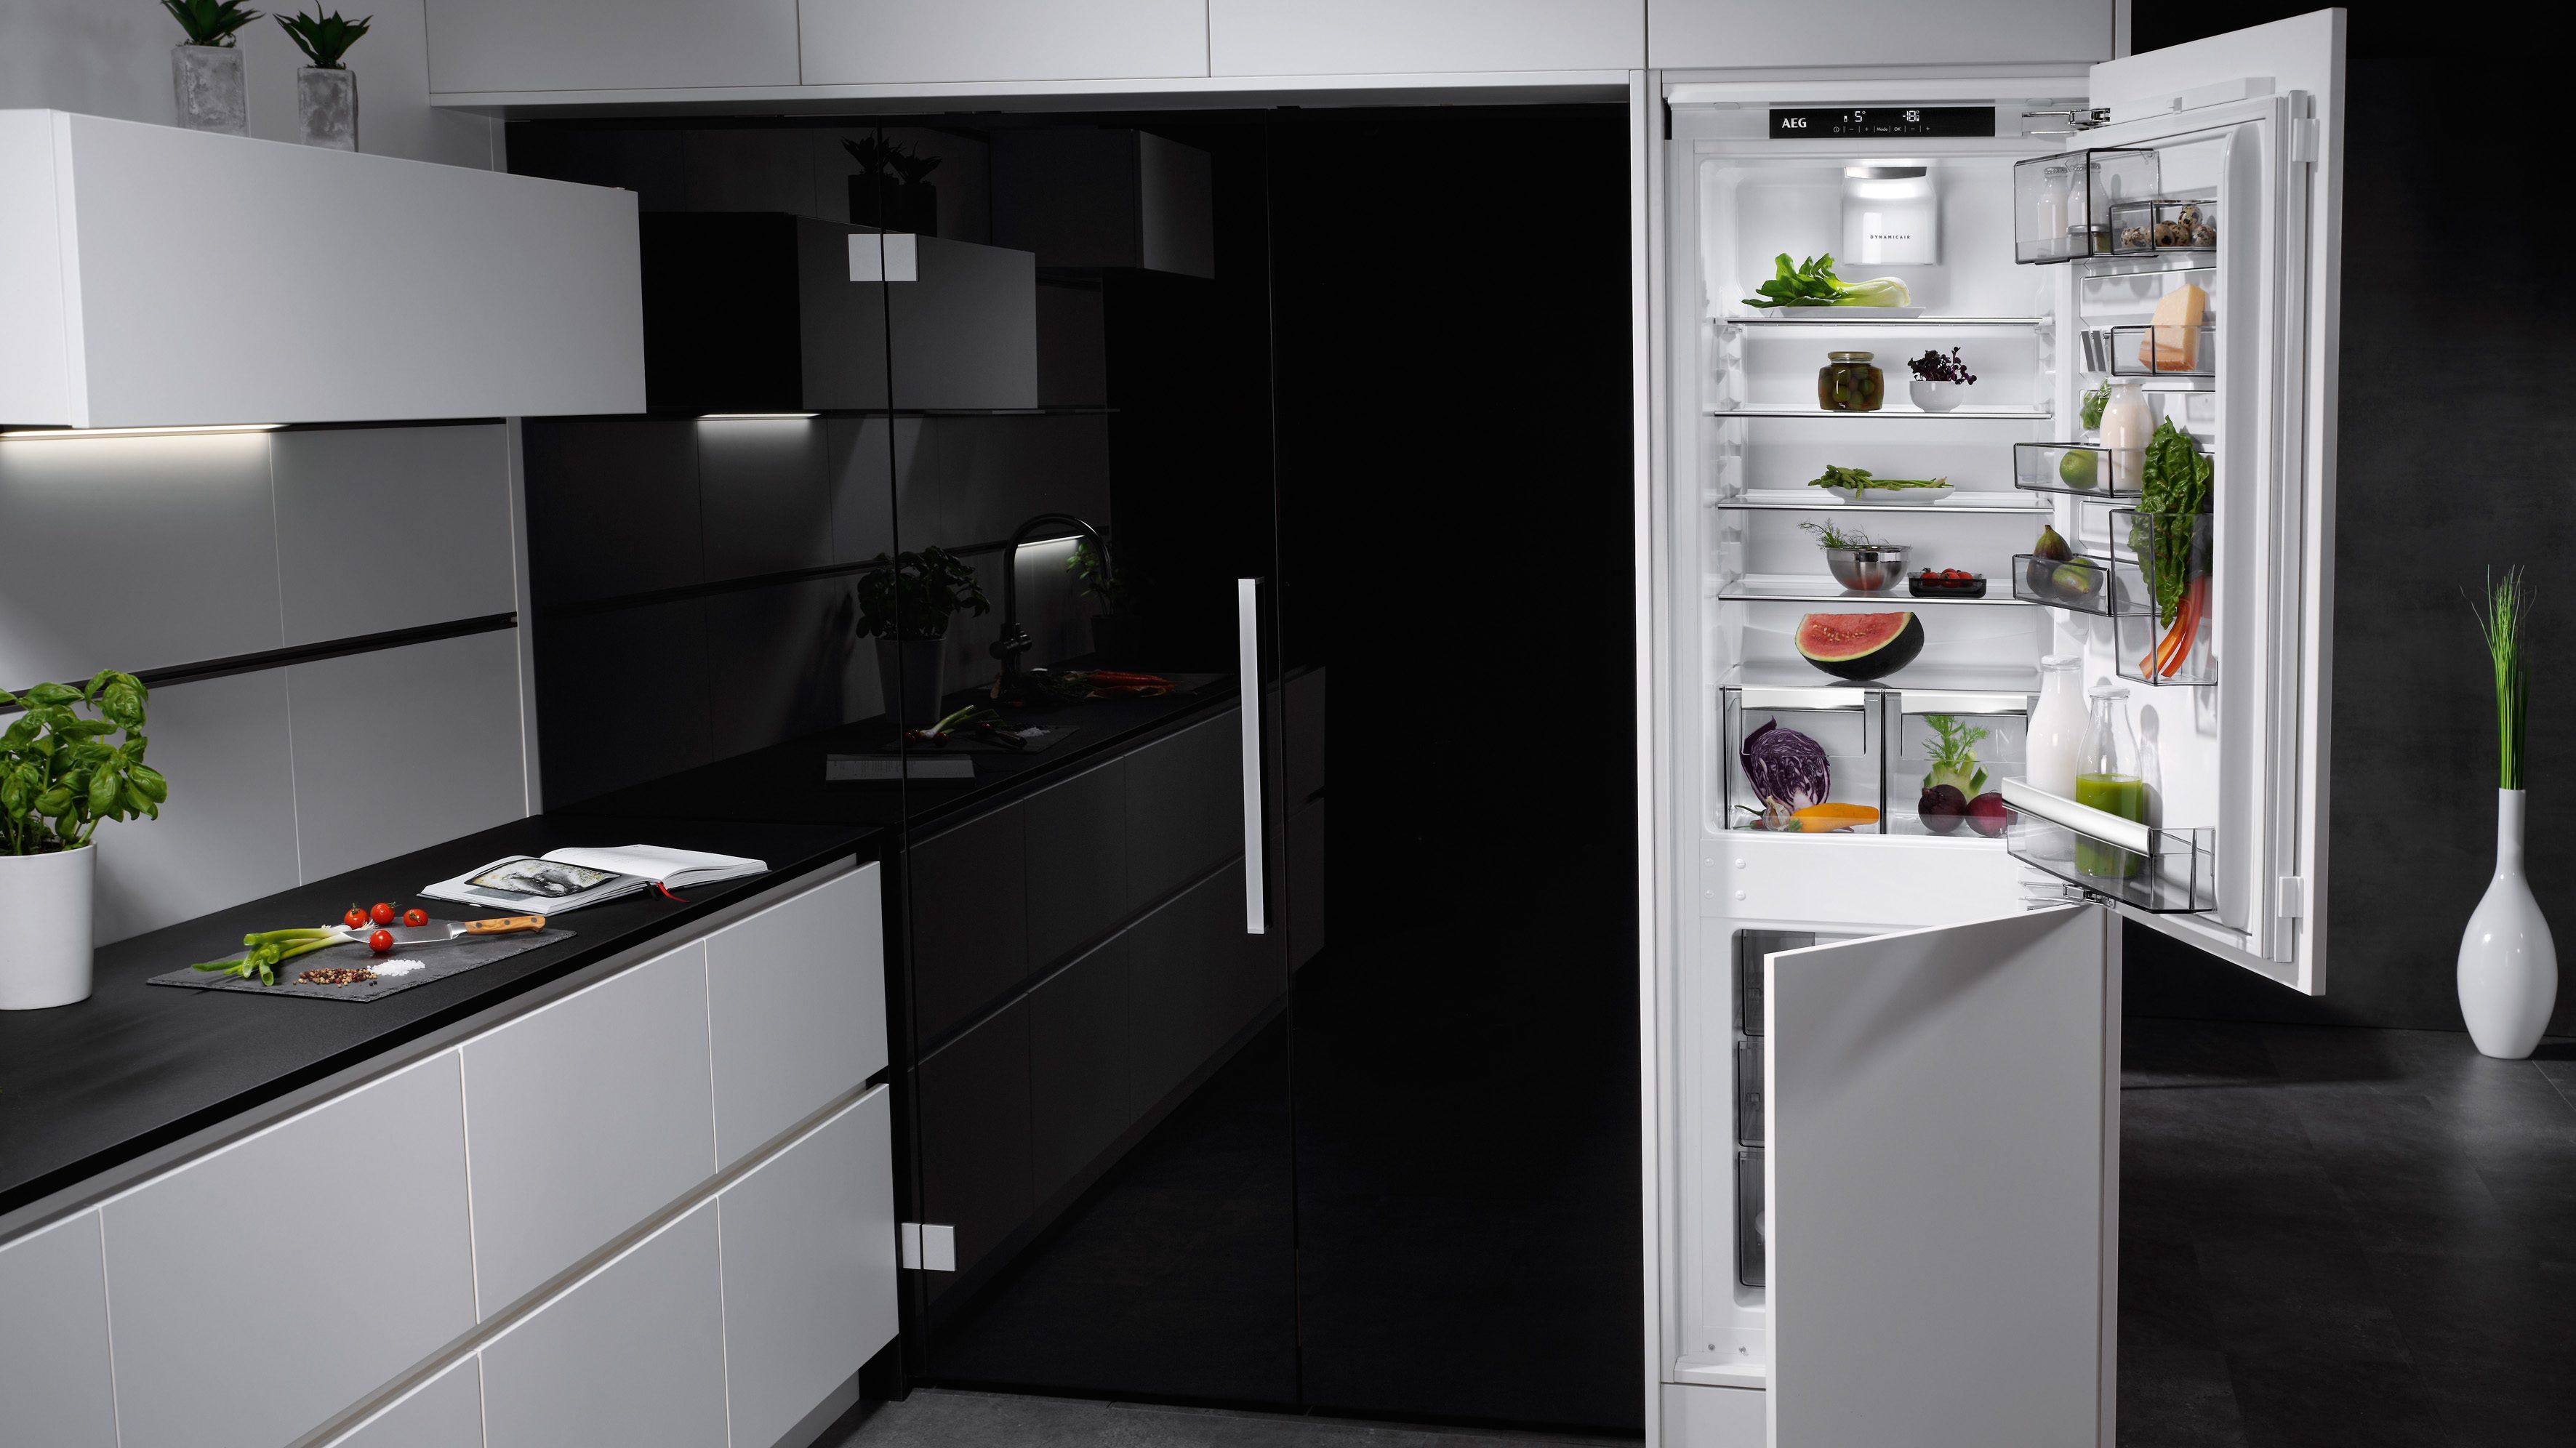 Gorenje Kühlschrank Temperatur Zu Kalt : Gorenje kühlschrank temperatur zu kalt gorenje rk ax